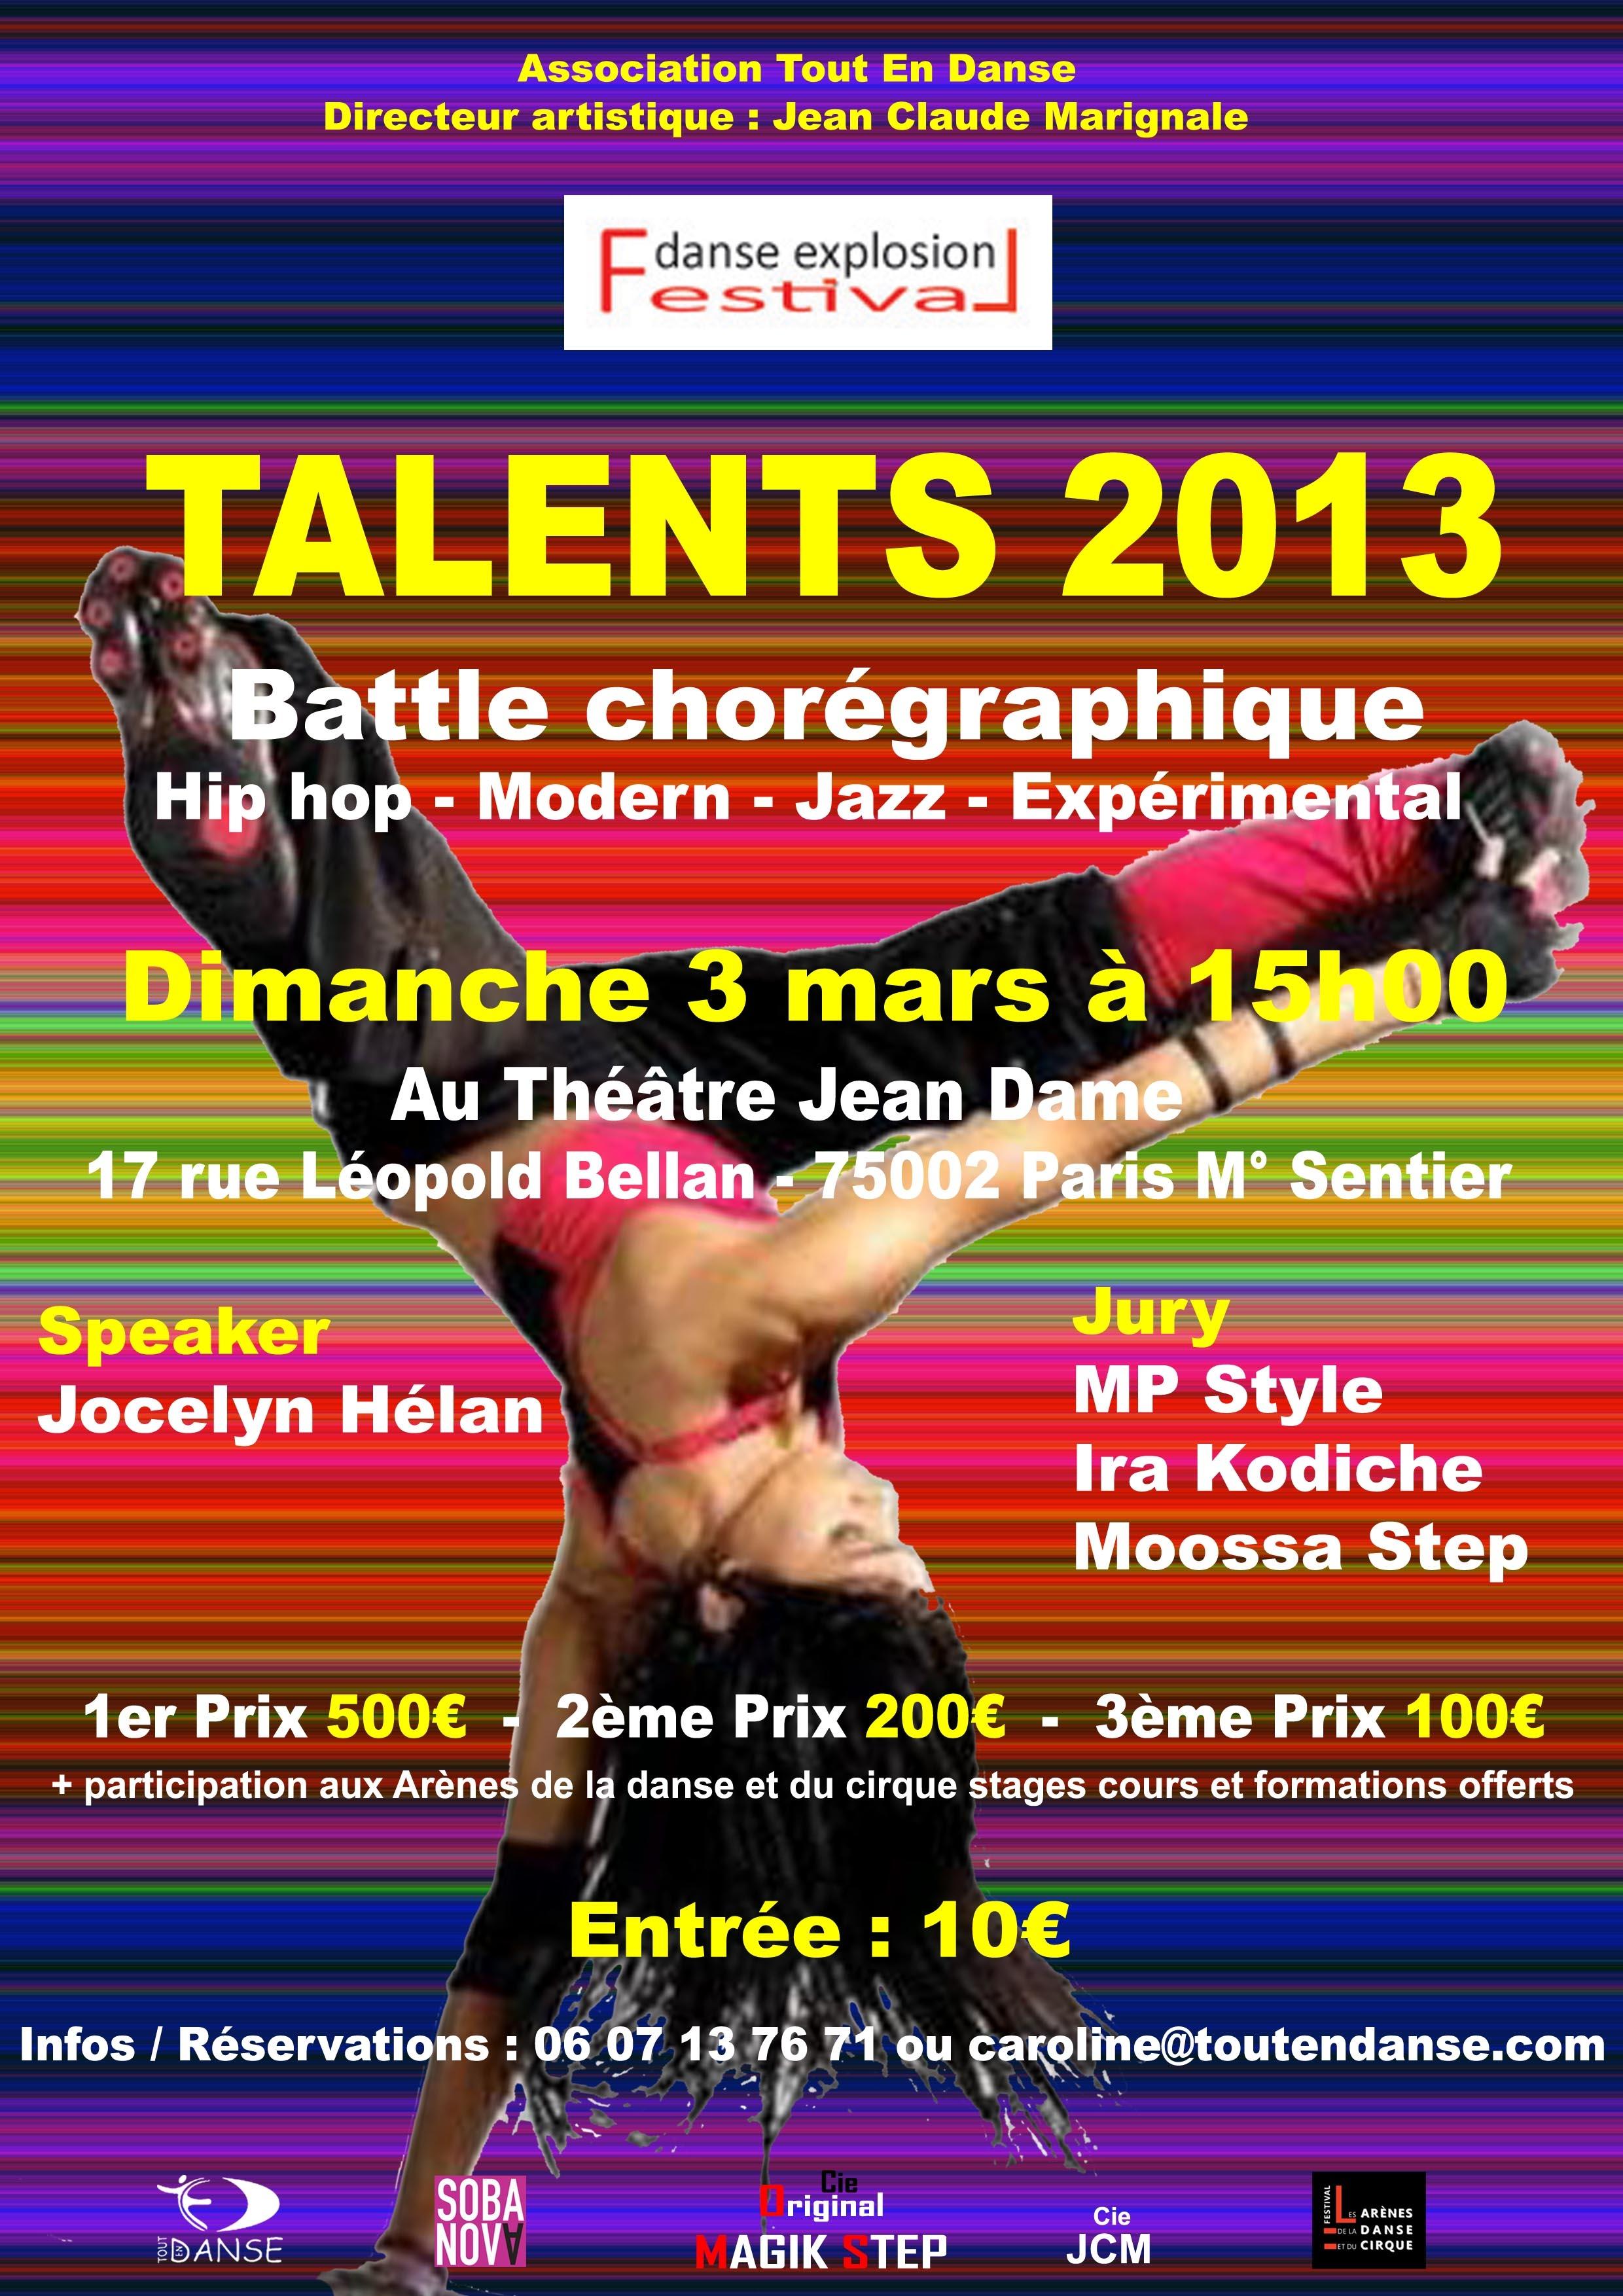 affiche-festival-danse-explosion-3-mars-2013-plaid.jpg